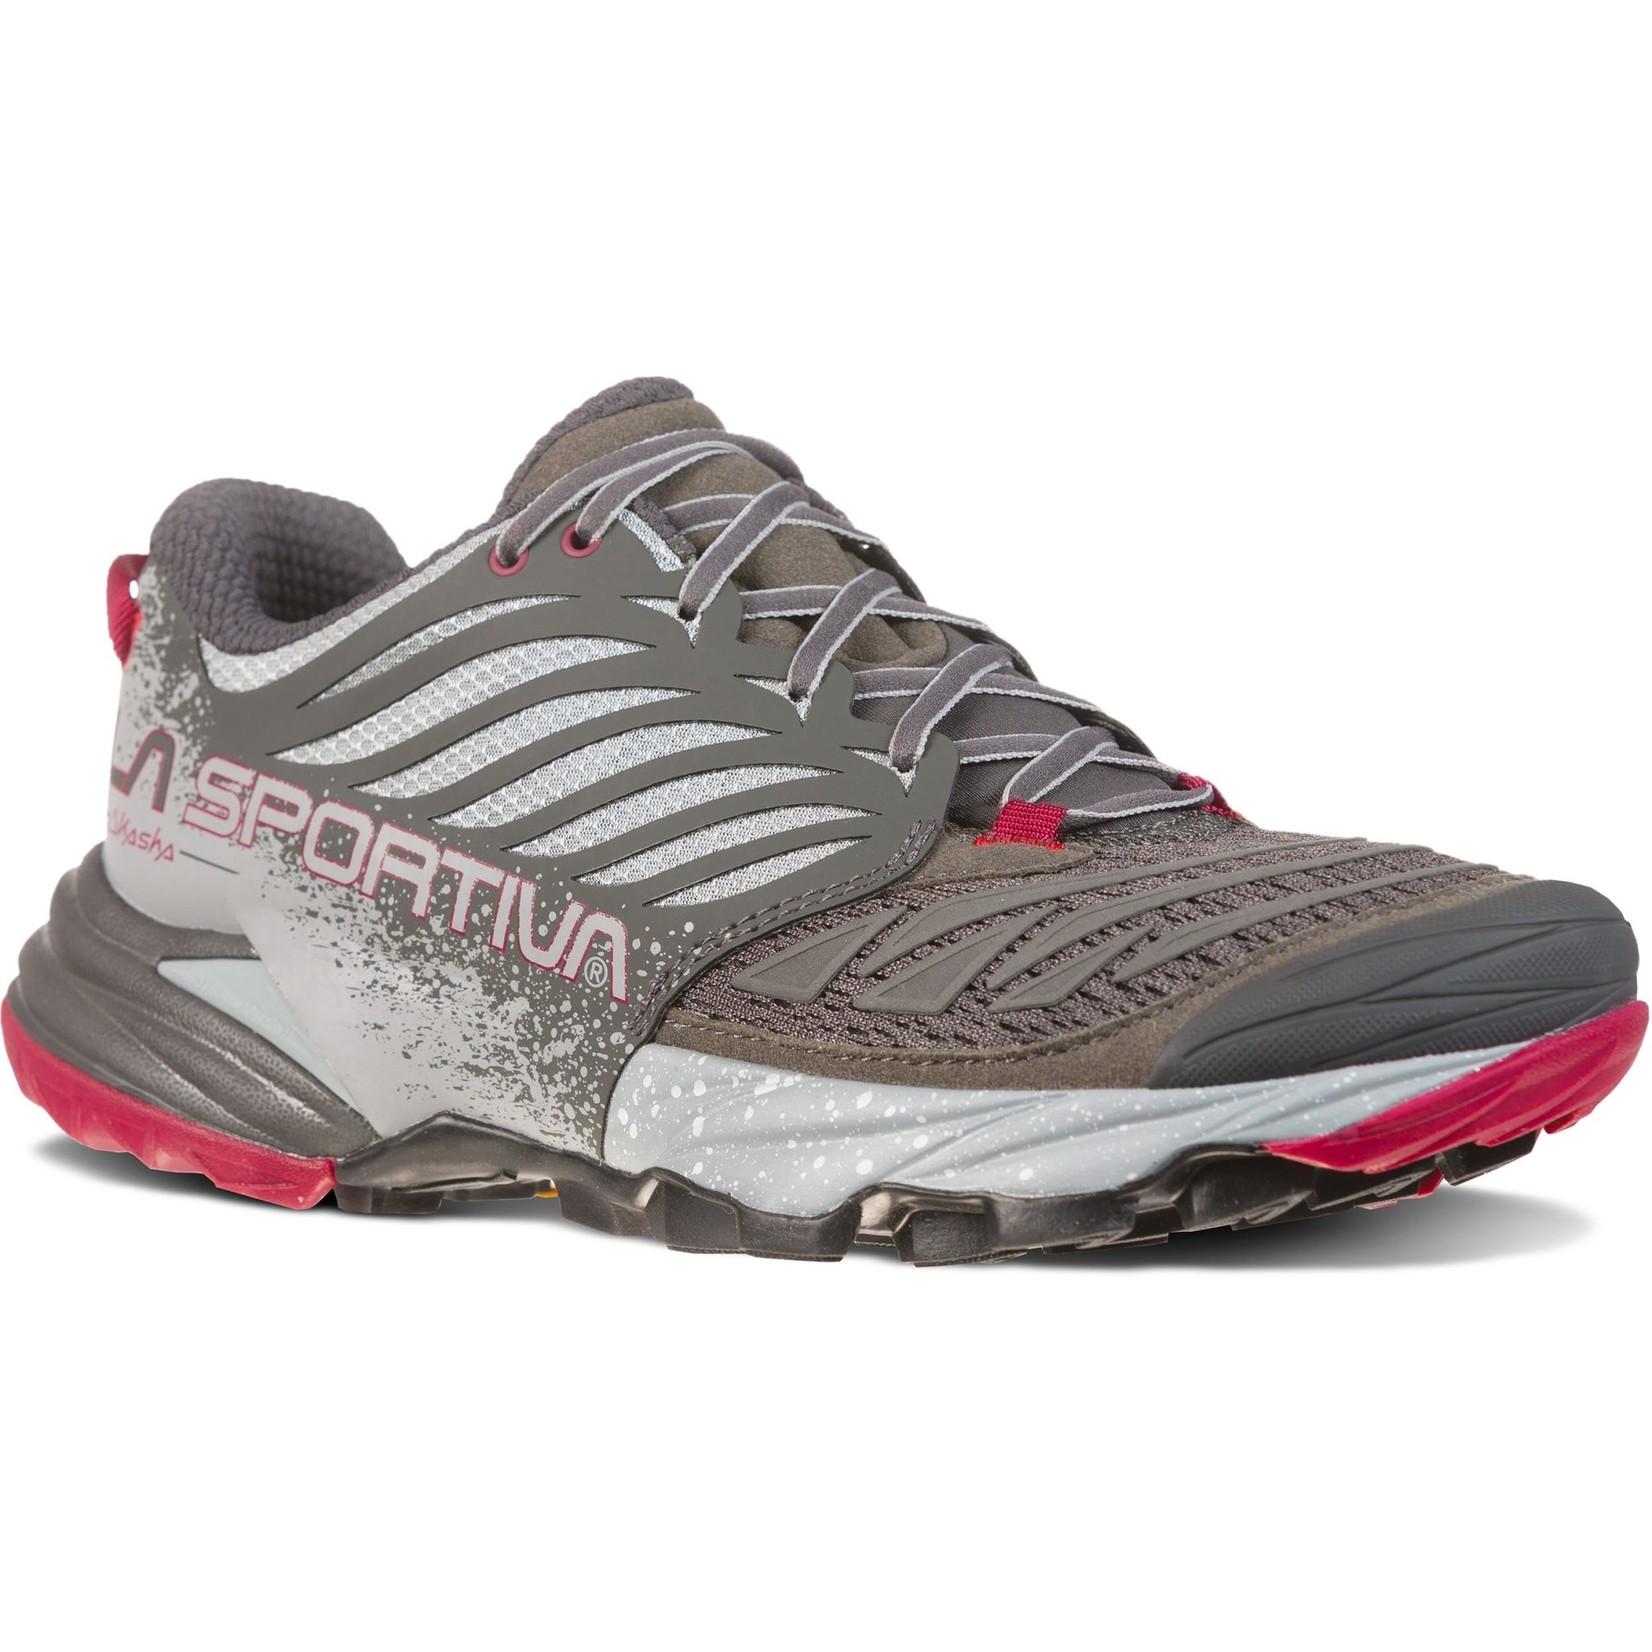 La Sportiva La Sportiva Akasha Running Shoes - Women